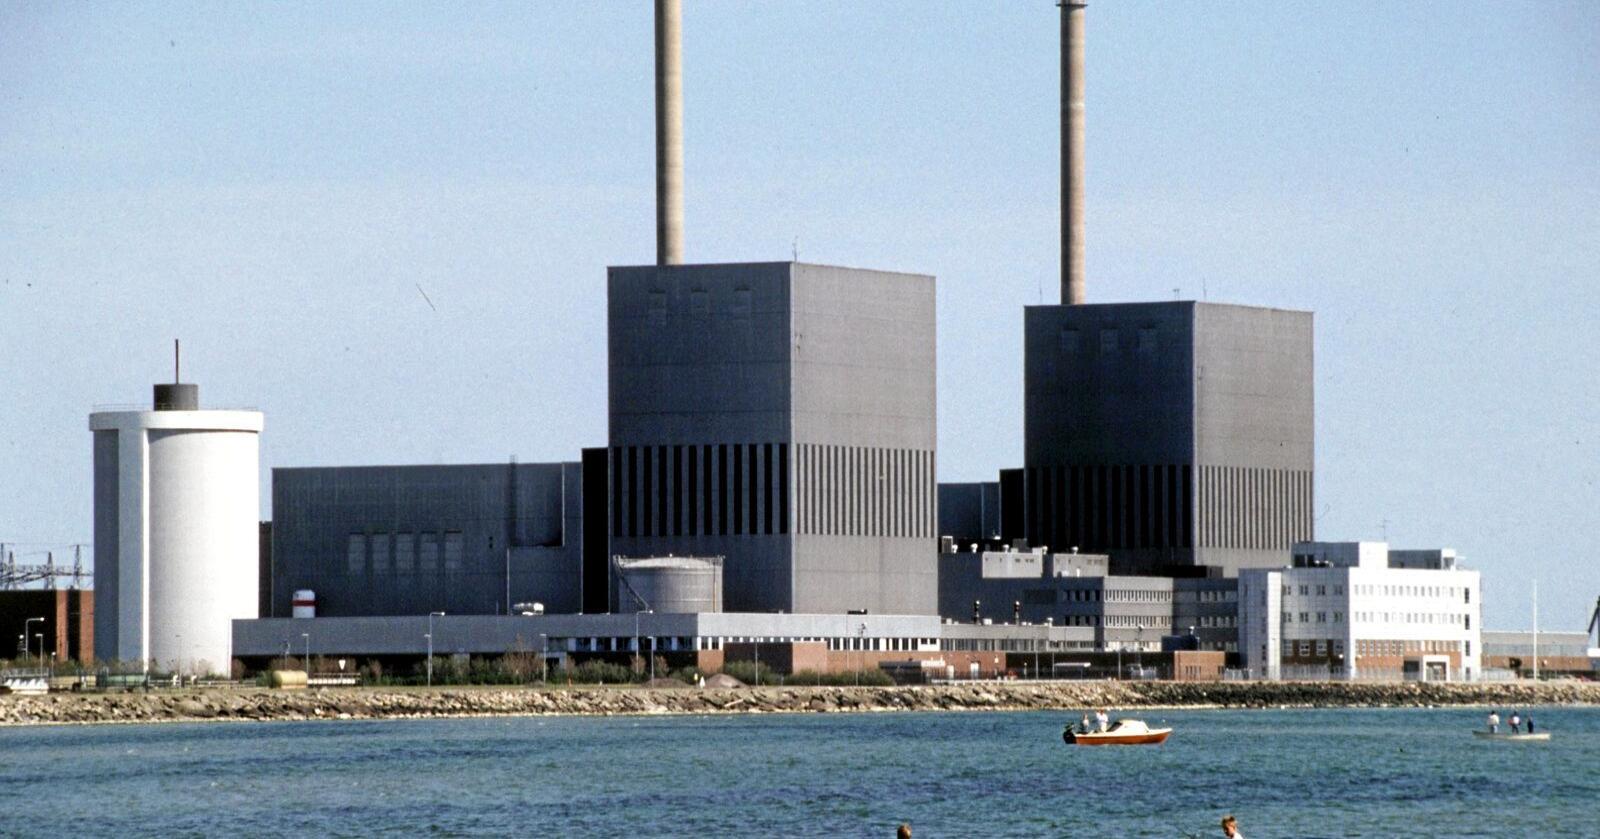 Krever lite areal og ingen vassdrag: Barsebäck atomkraftverk i Sverige. Foto: Janerik Henriksson/Scanpix